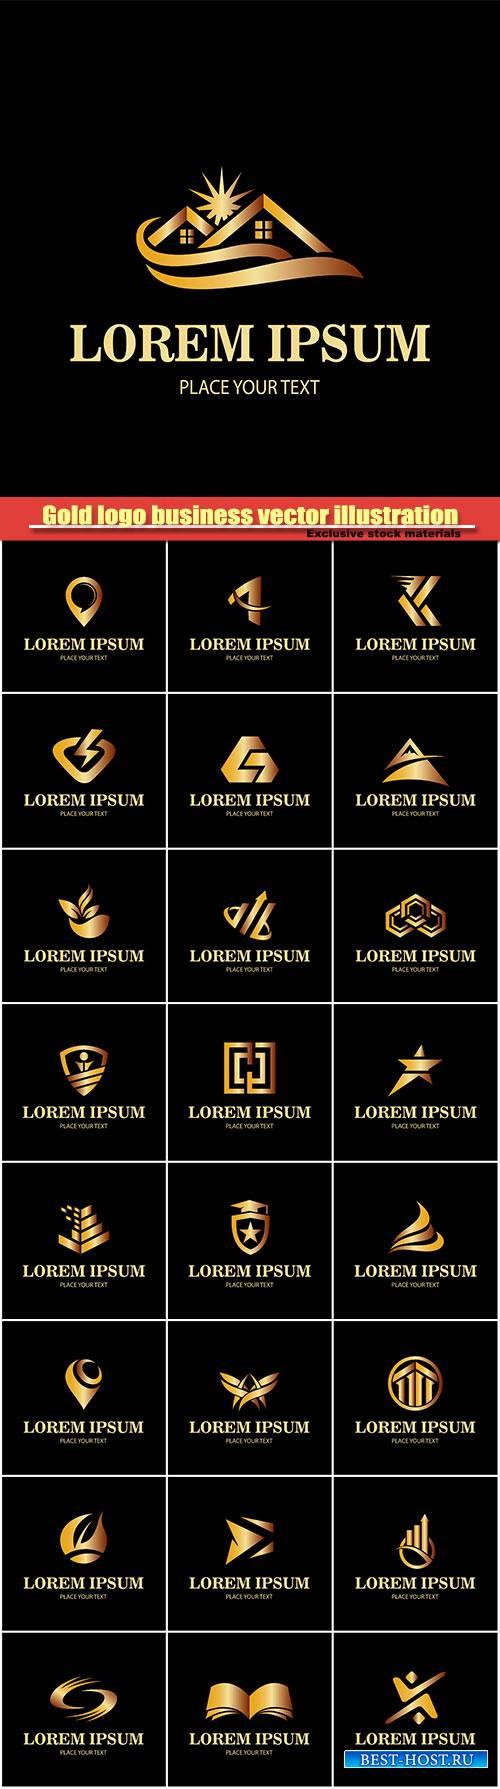 Gold logo business vector illustration #7